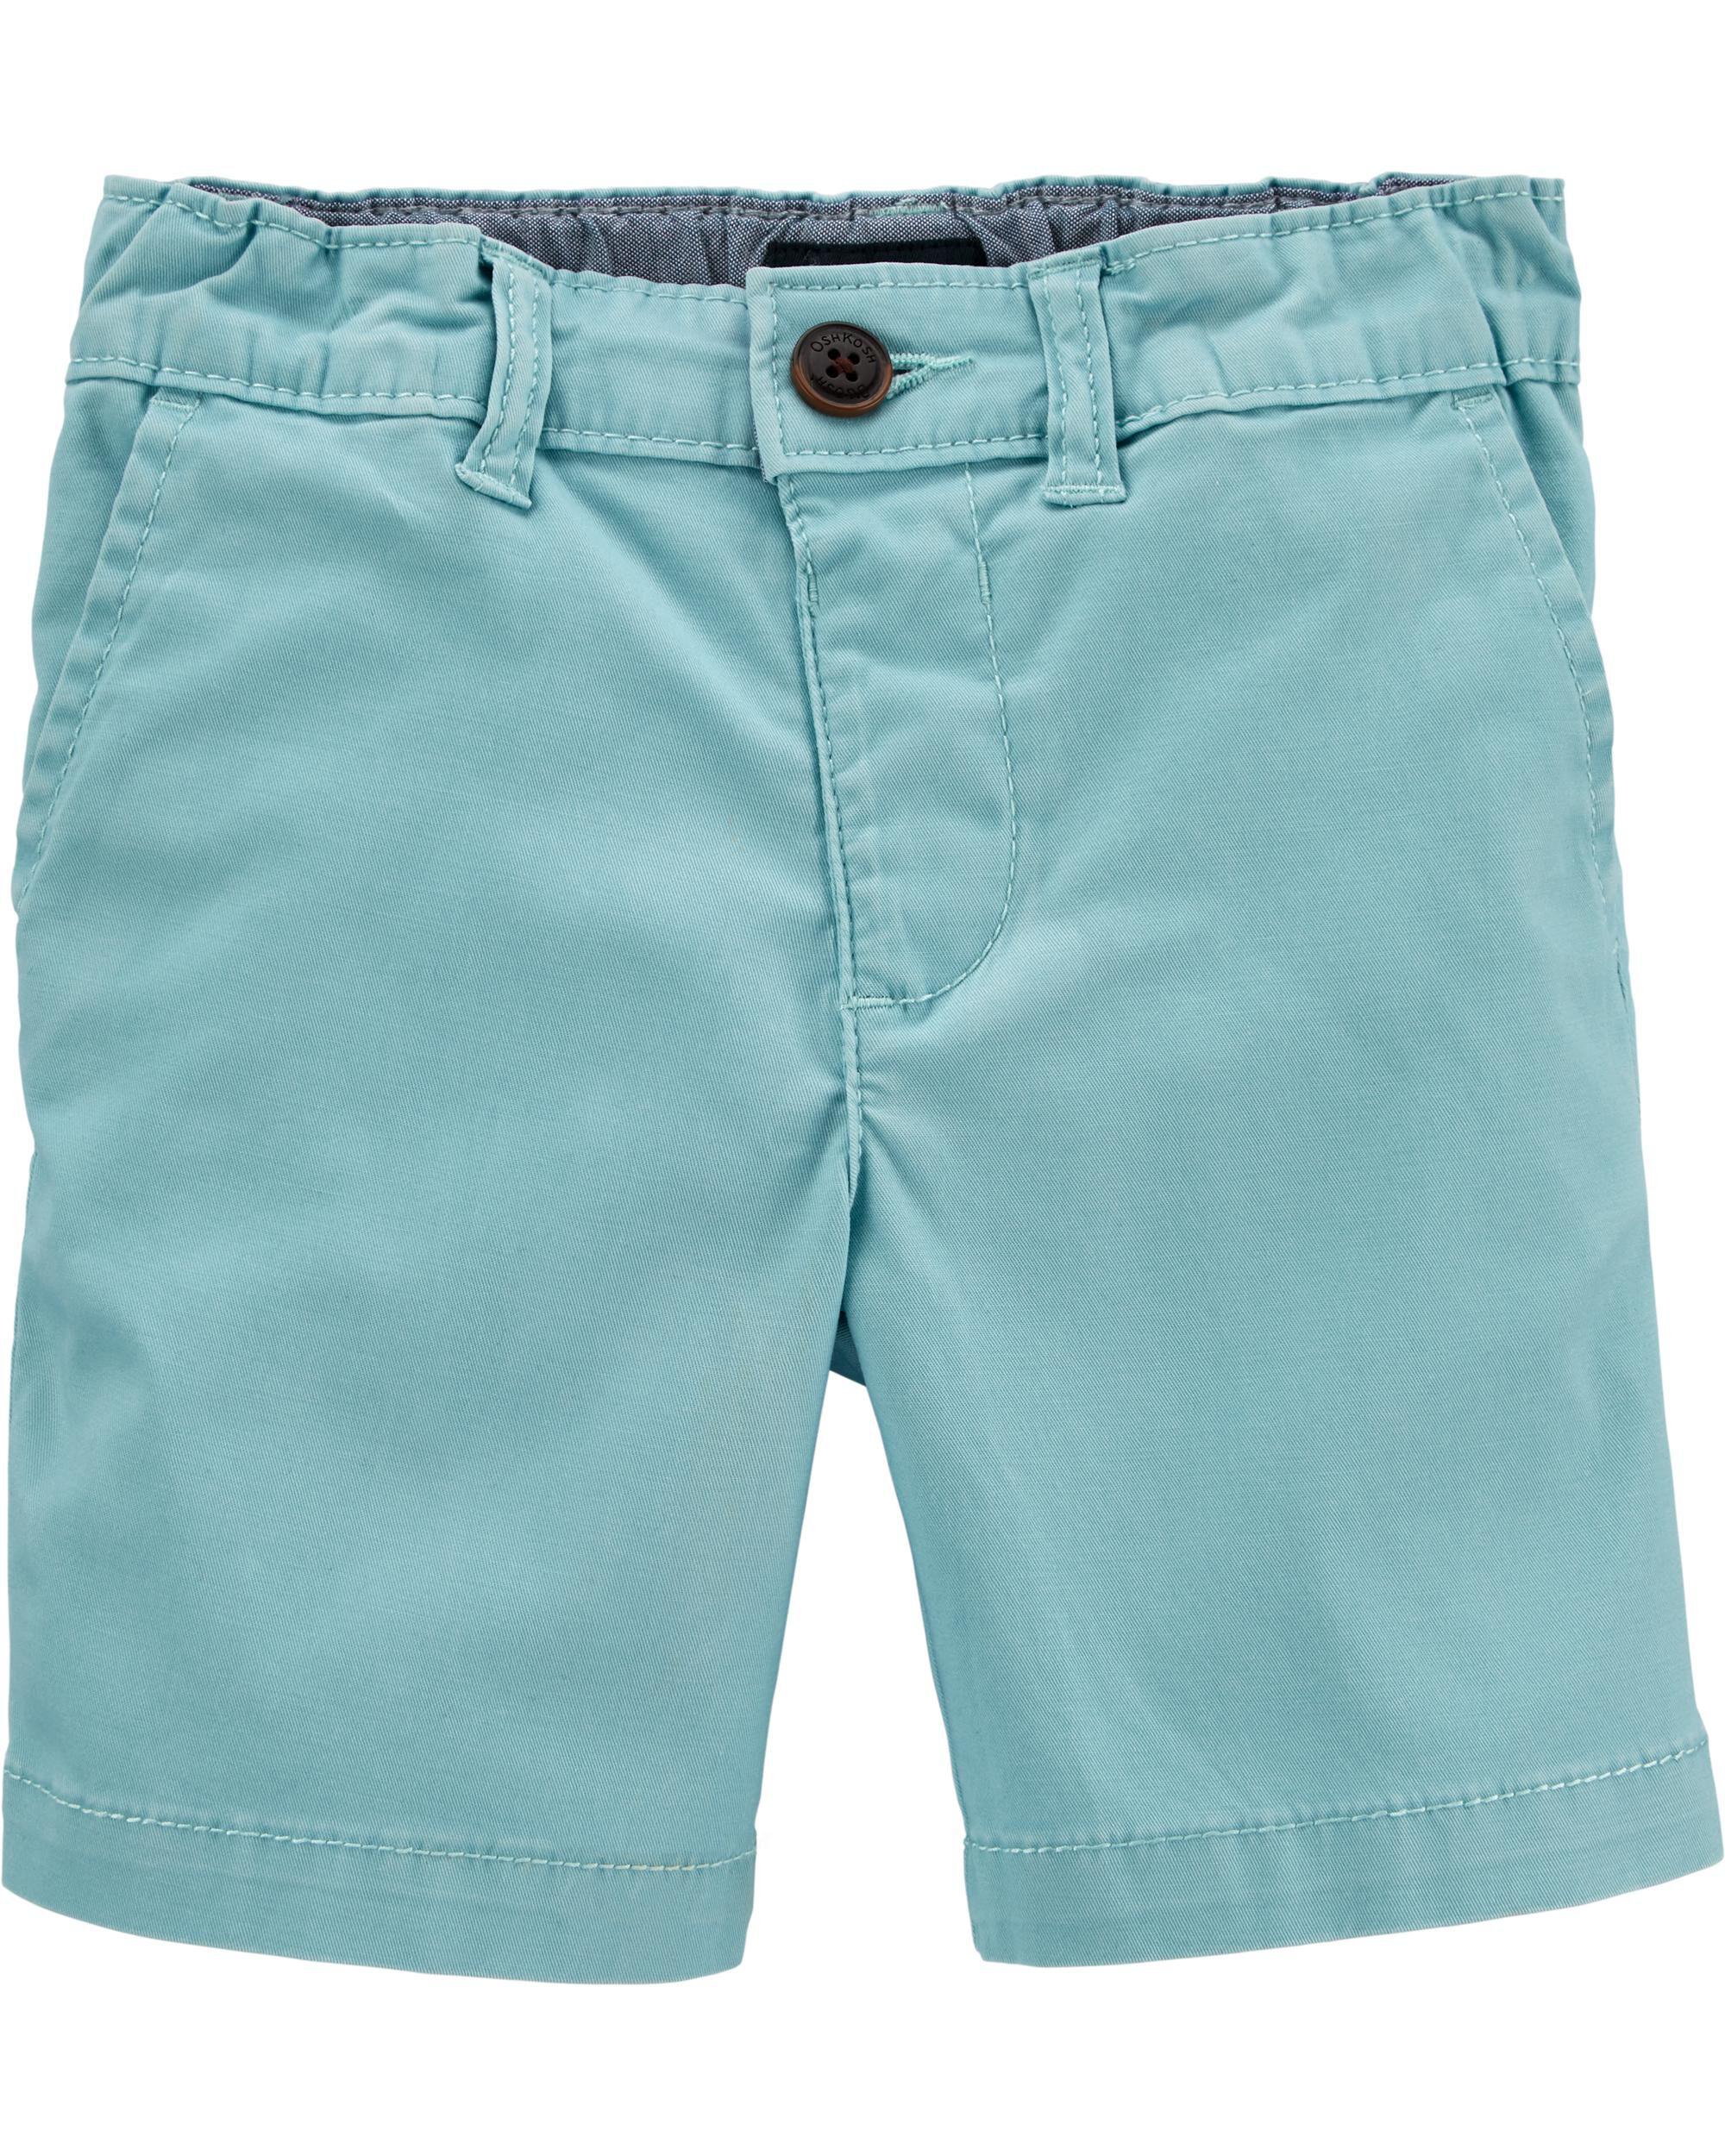 Carters Boys 2T-5T Stretch Waist Shorts